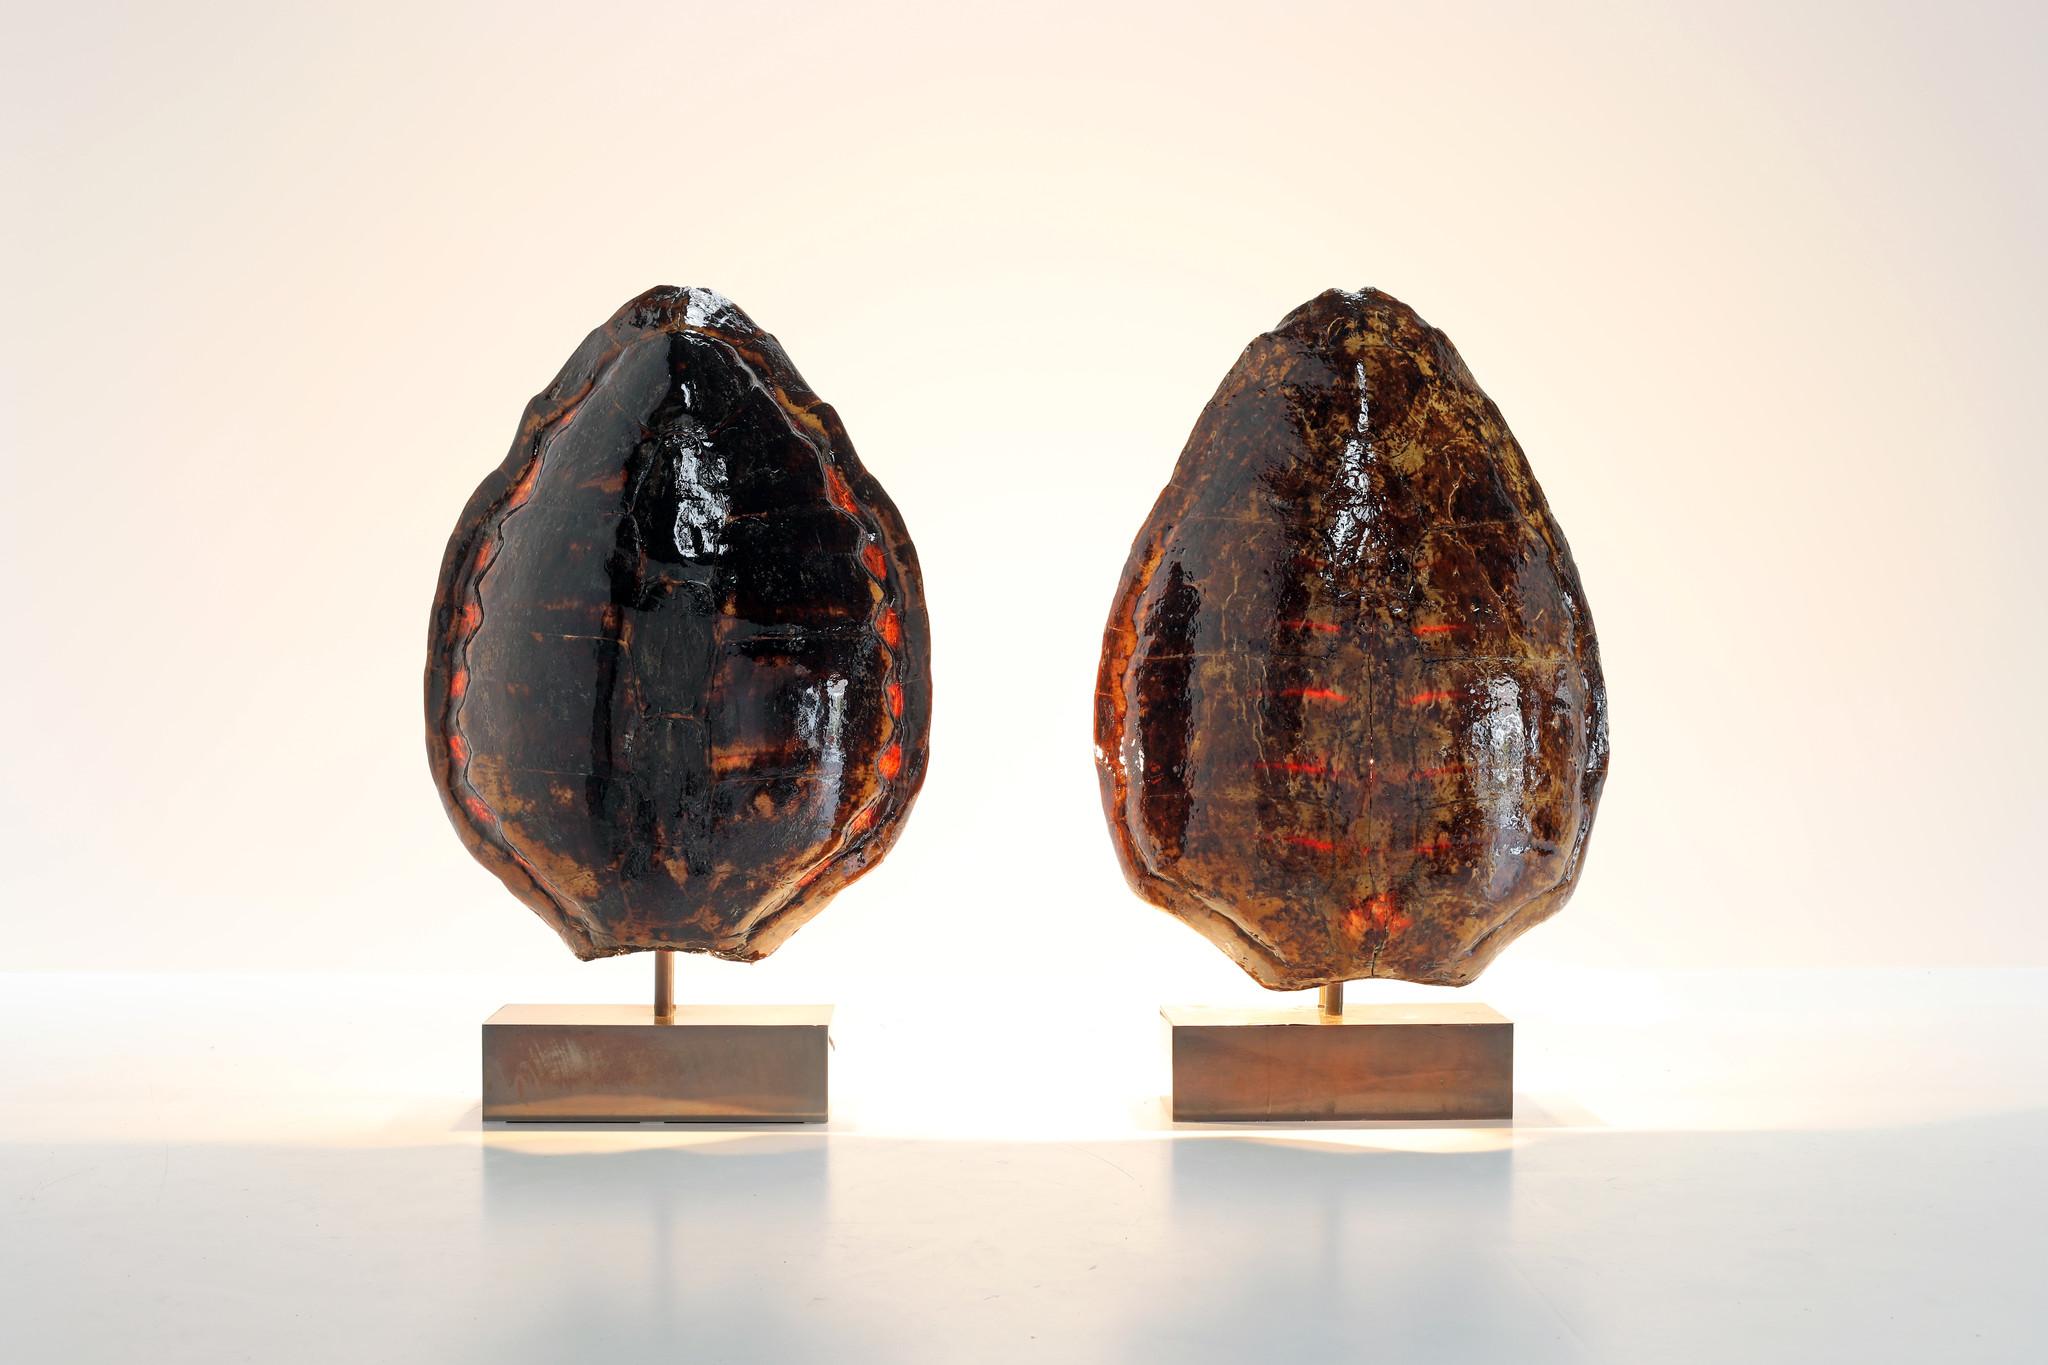 Belgo Chrom Tortoise lampen, jaren 60